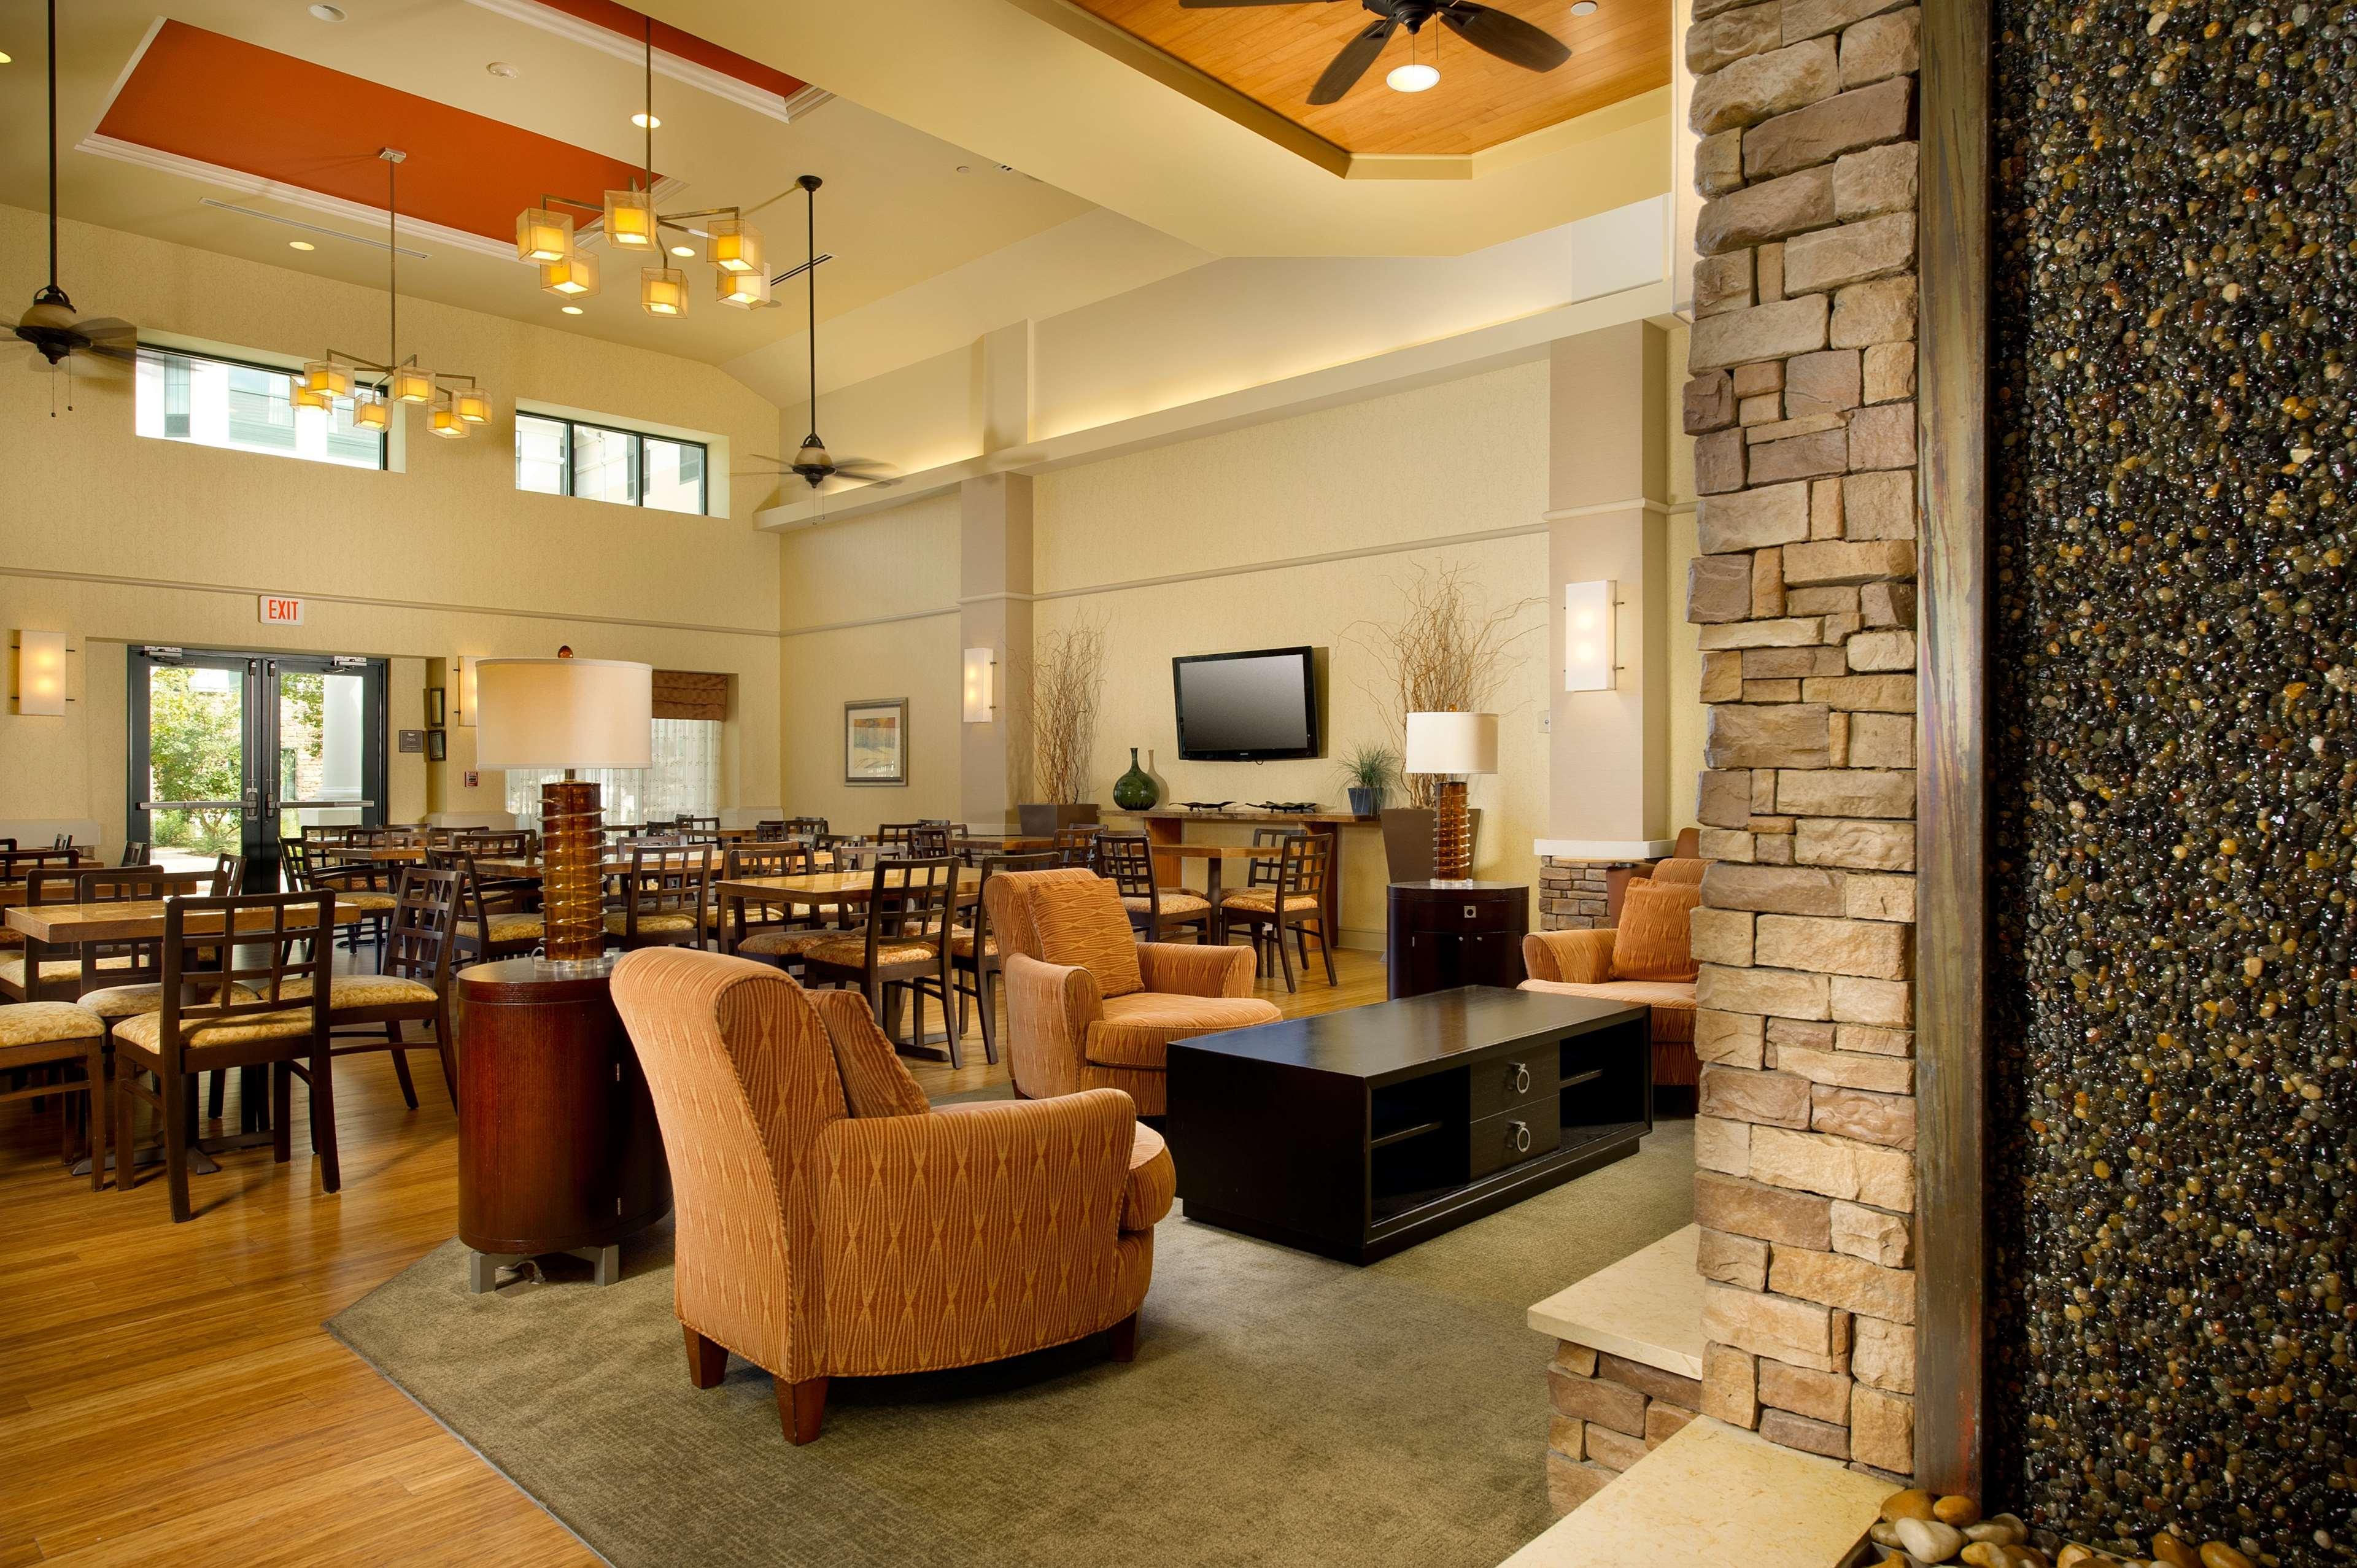 Homewood Suites by Hilton Columbus image 7